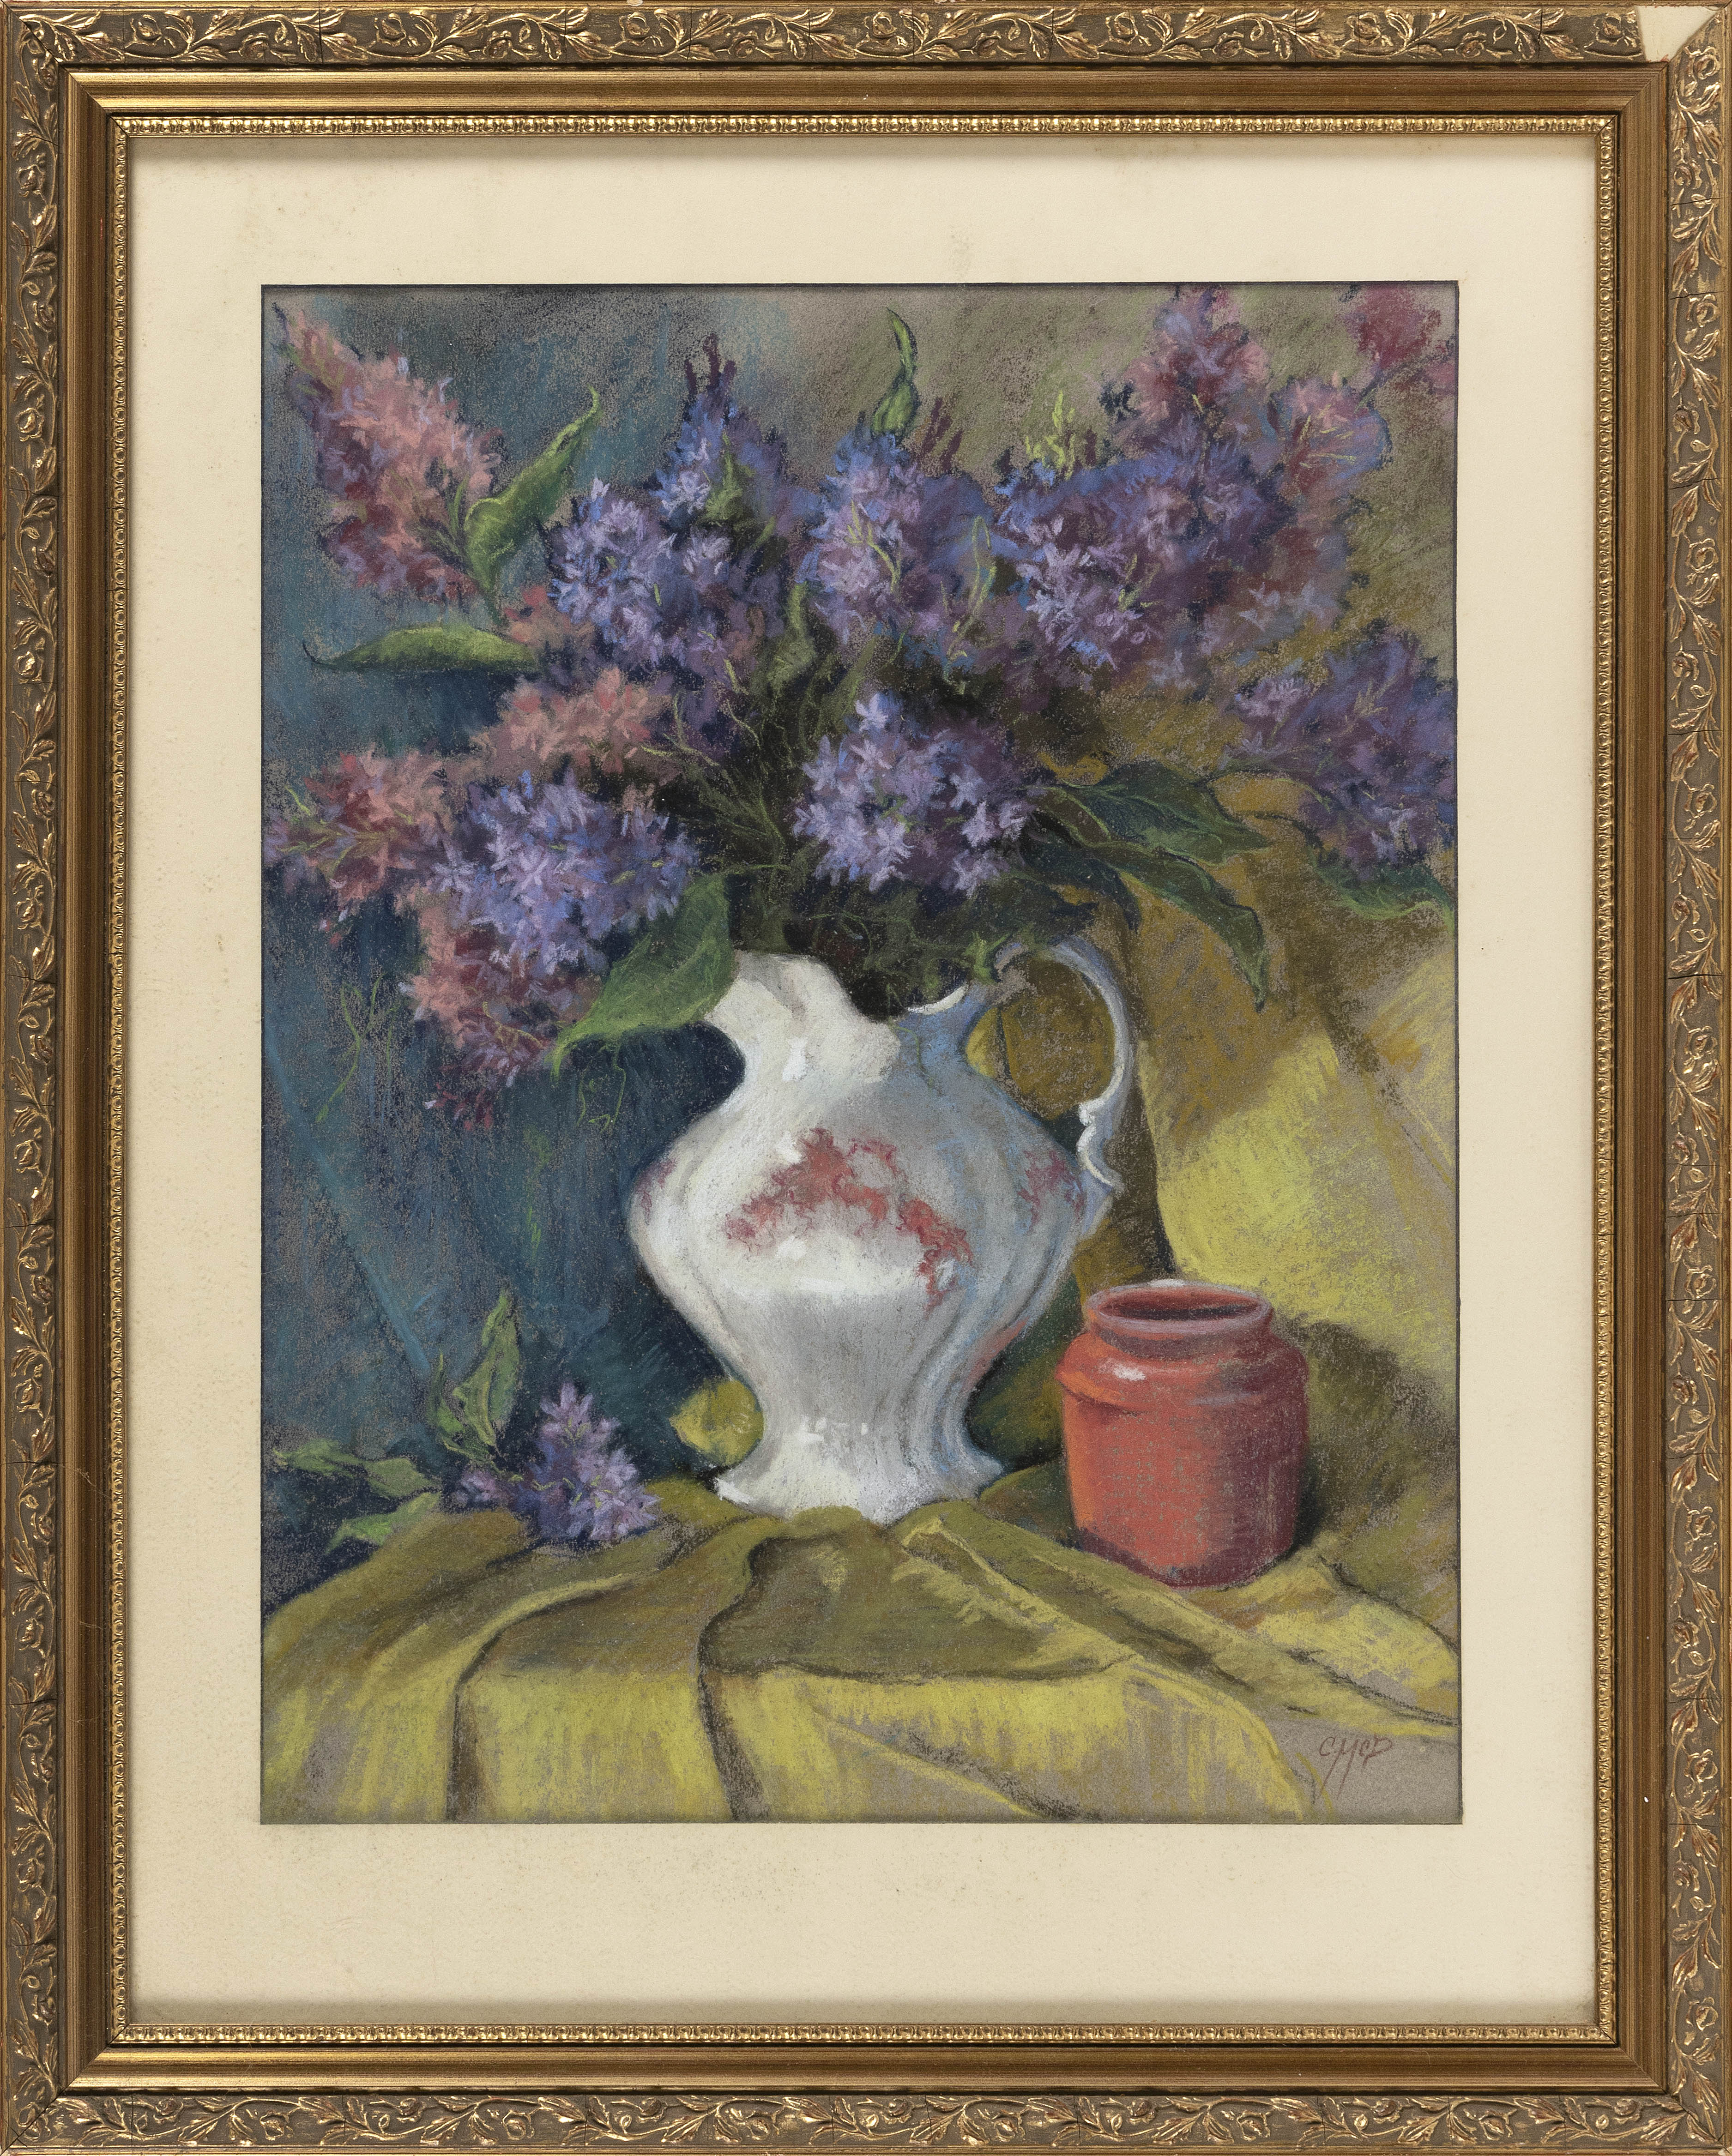 "CHERYL MCDONALD (Connecticut, Contemporary), Floral still life., Pastel on paper, 18"" x 14"" sight. Framed 25.5"" x 20.5""."